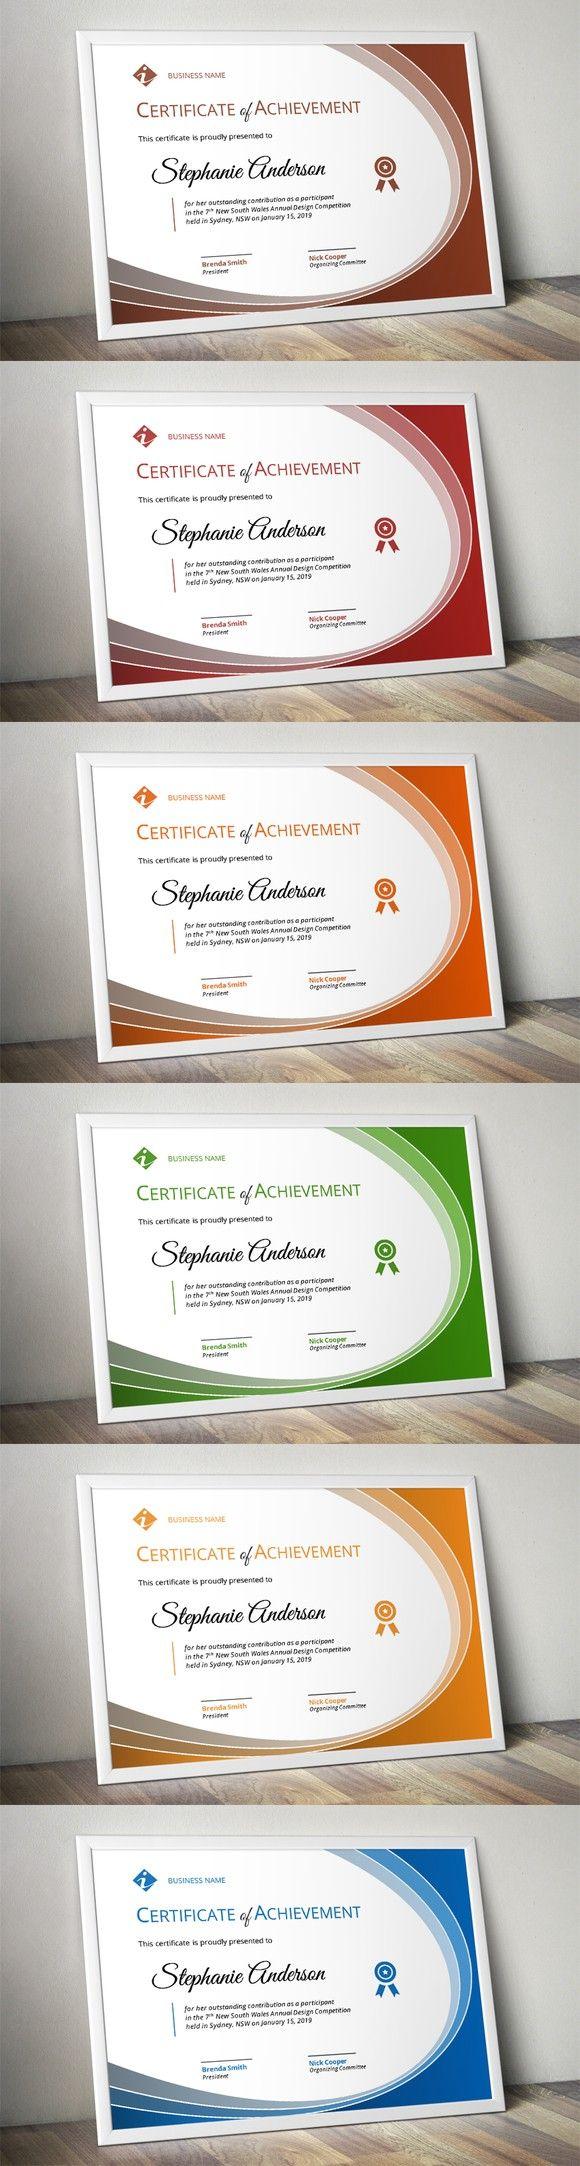 80 besten diplome et certificat Bilder auf Pinterest ...